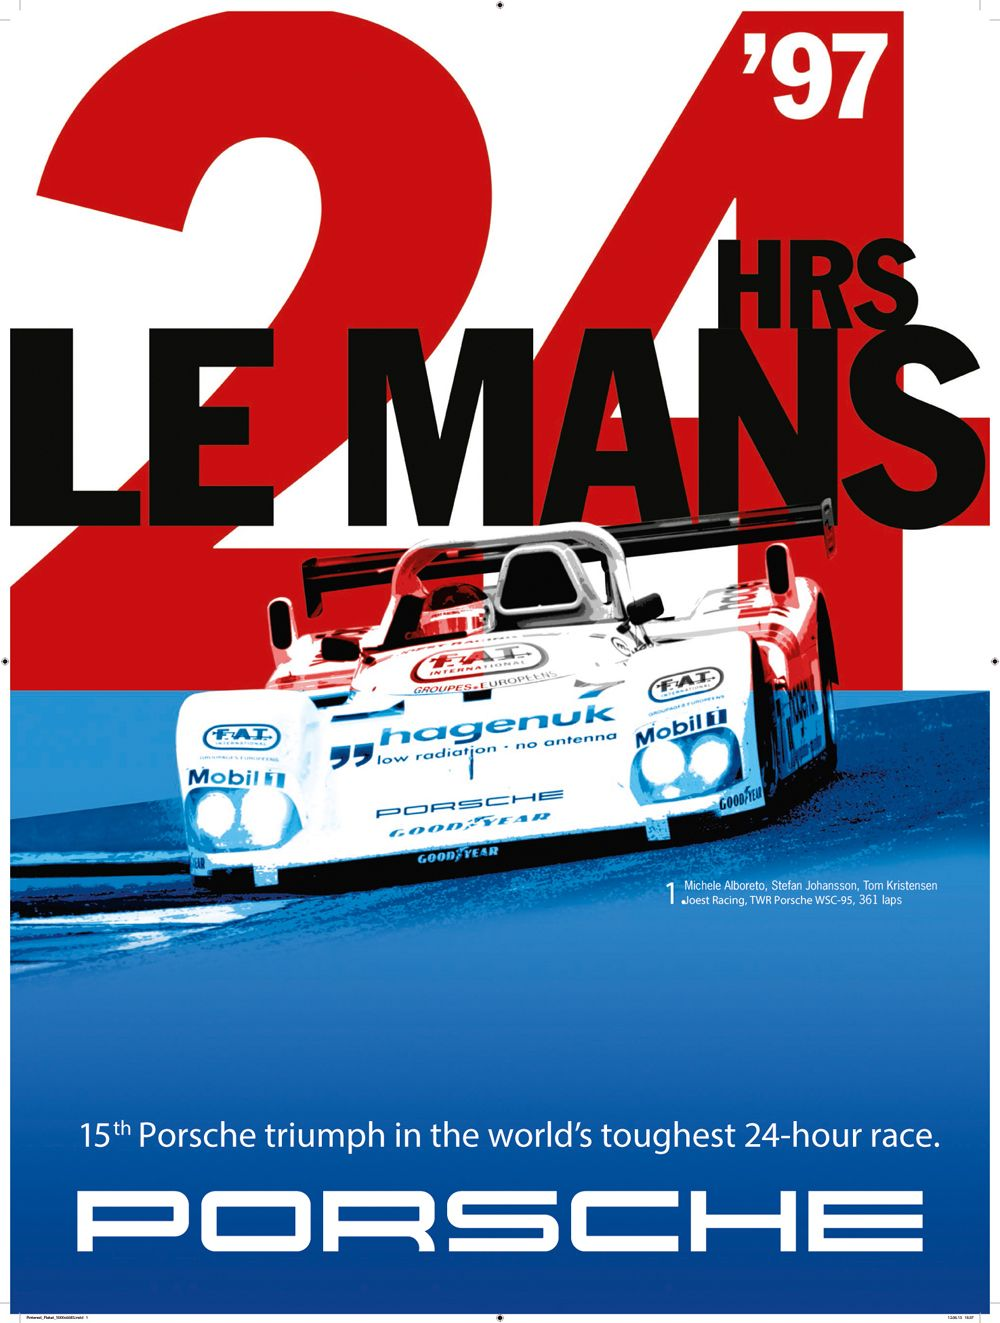 17 - PORSCHE - 24h de Le Mans 1997